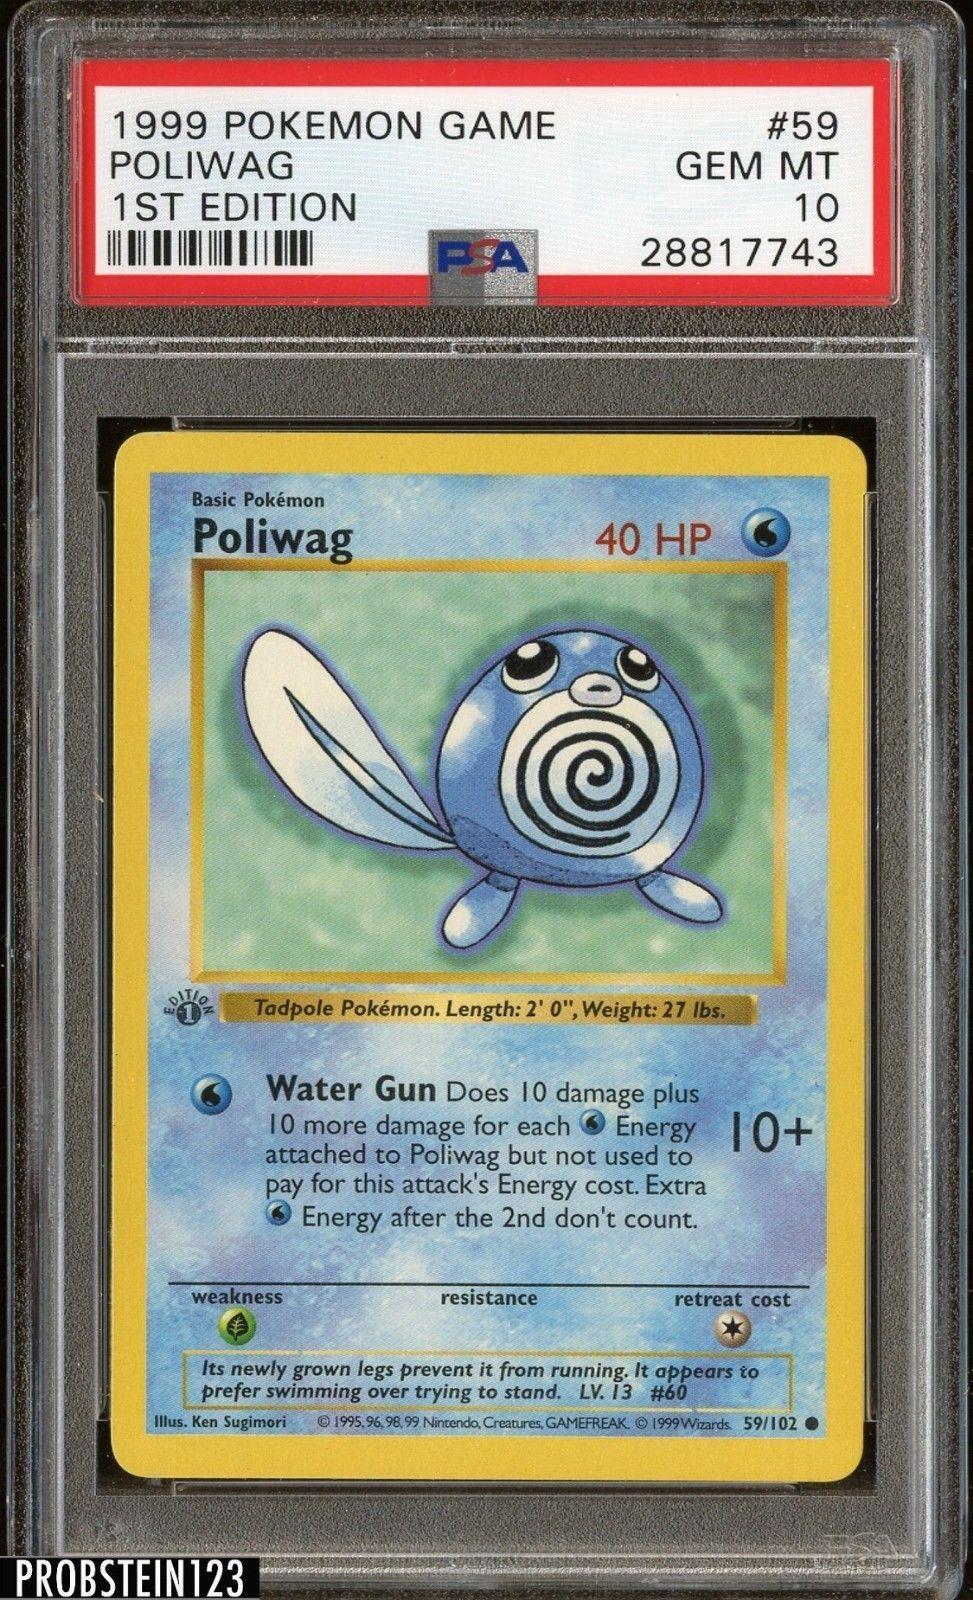 1999 pokemon game 1st edition 59 poliwag psa 10 gem mint